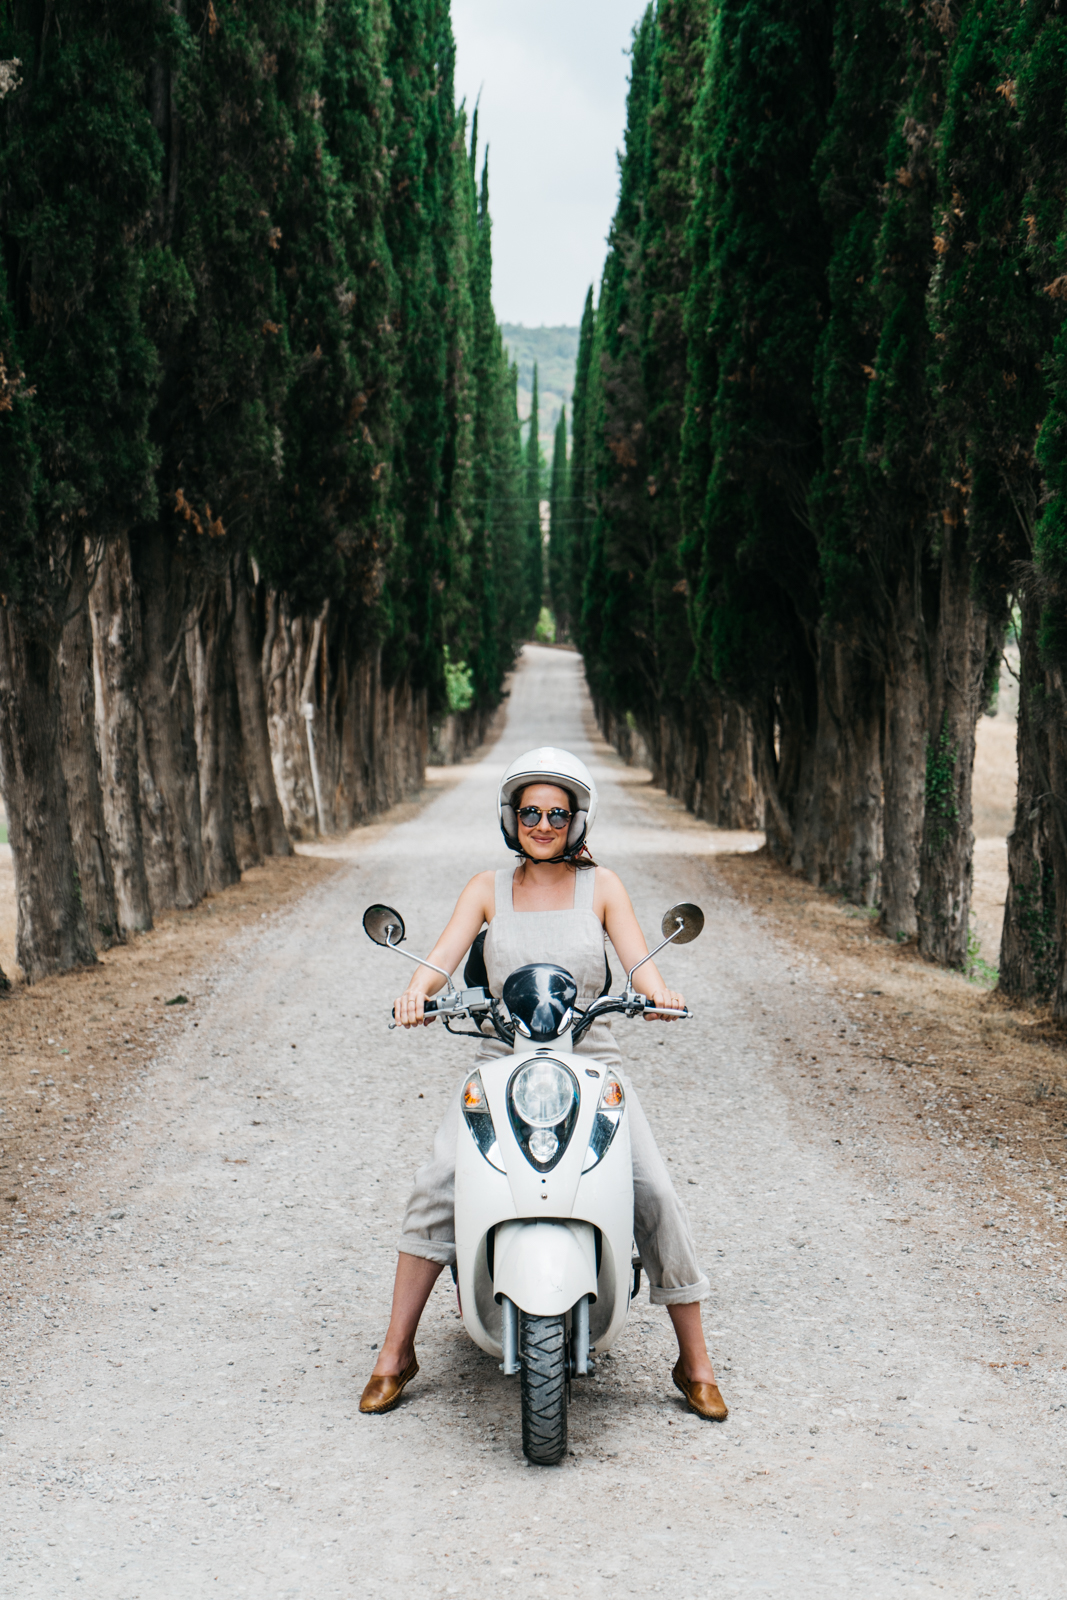 tuscany scooter rental italy